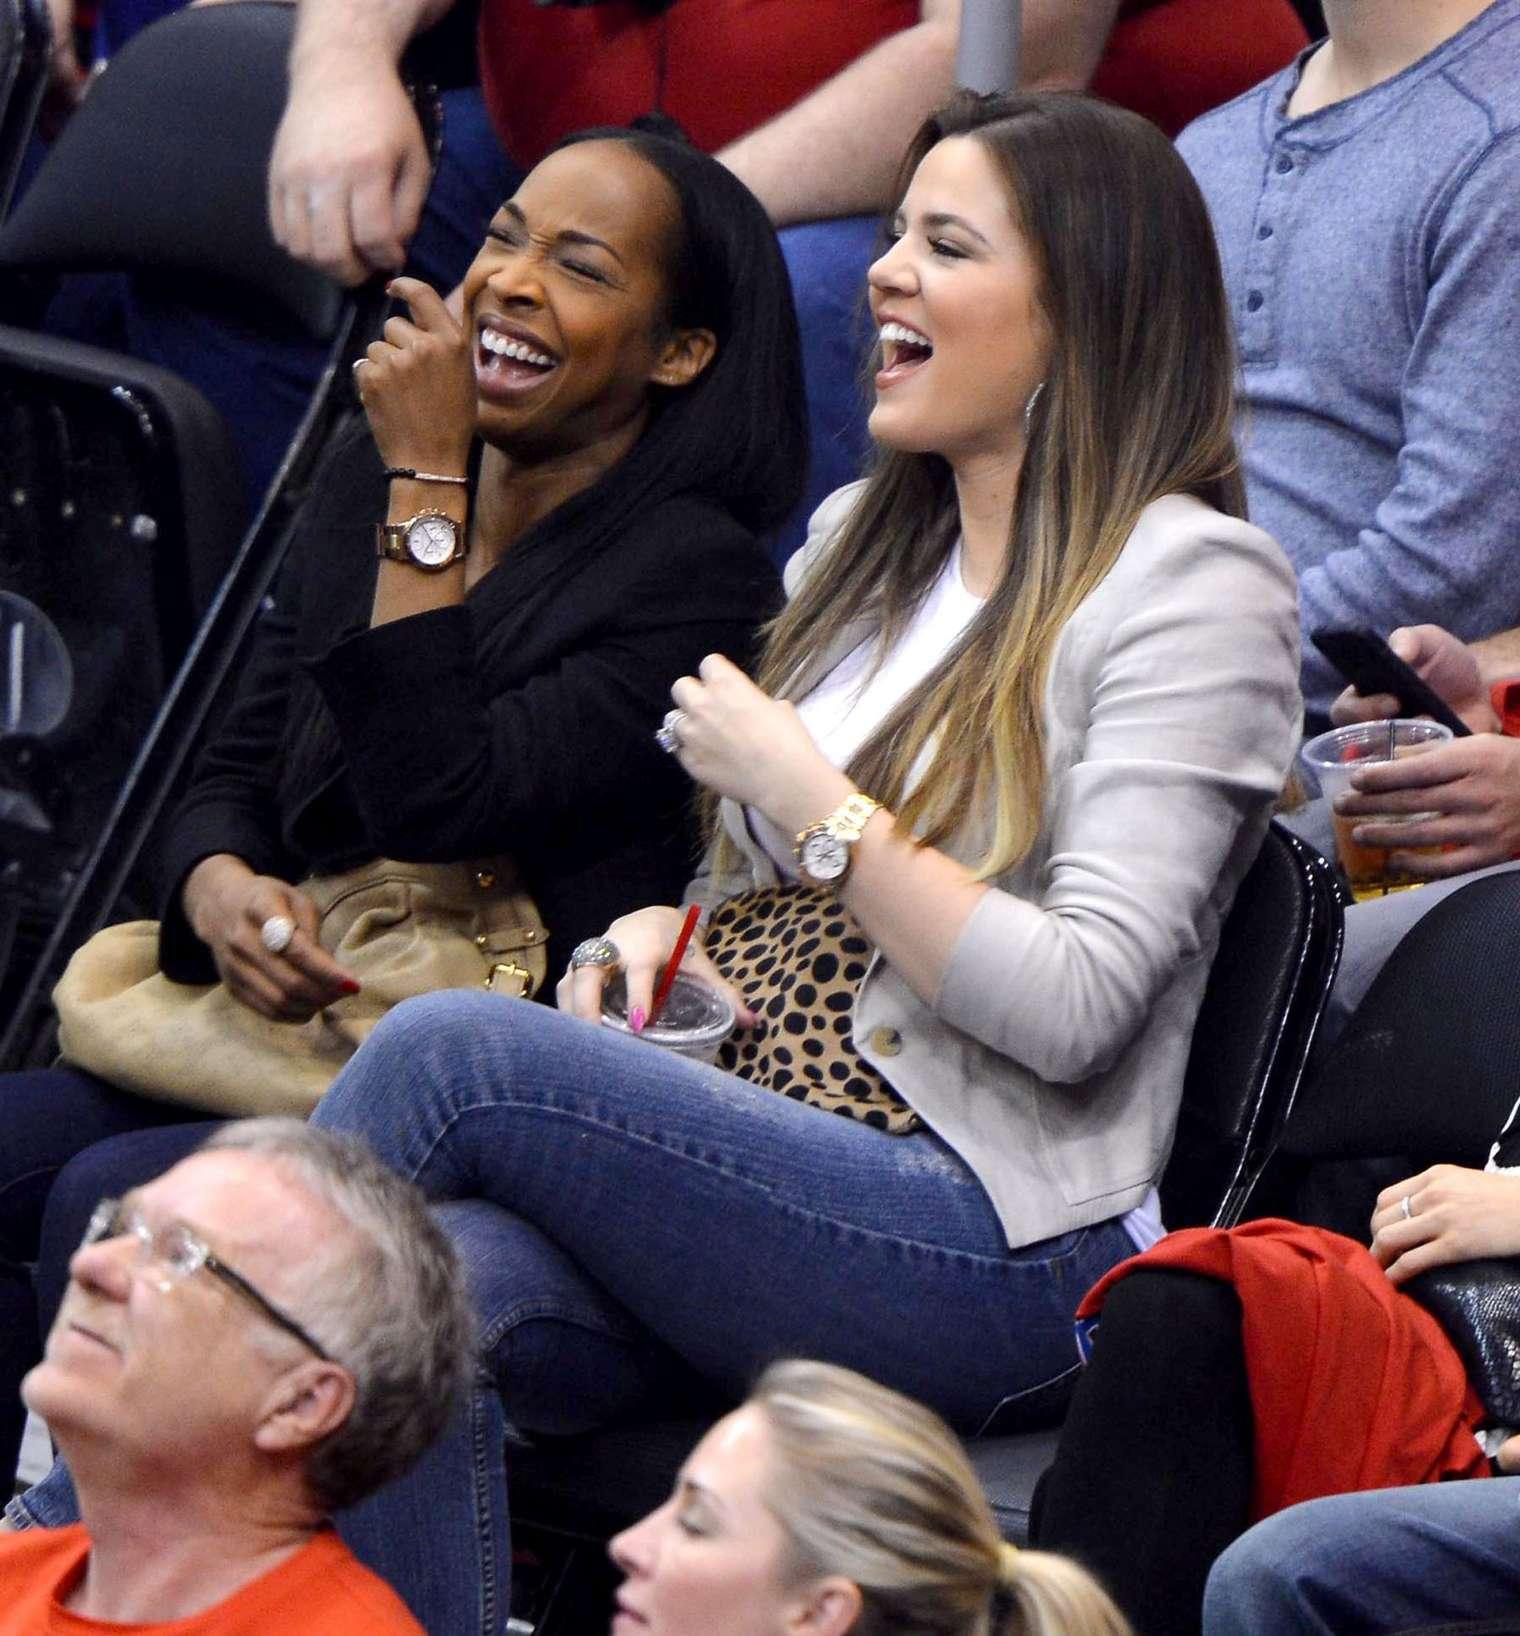 Khloe Kardashian 2013 : Khloe Kardashian at the LA Clippers game -07